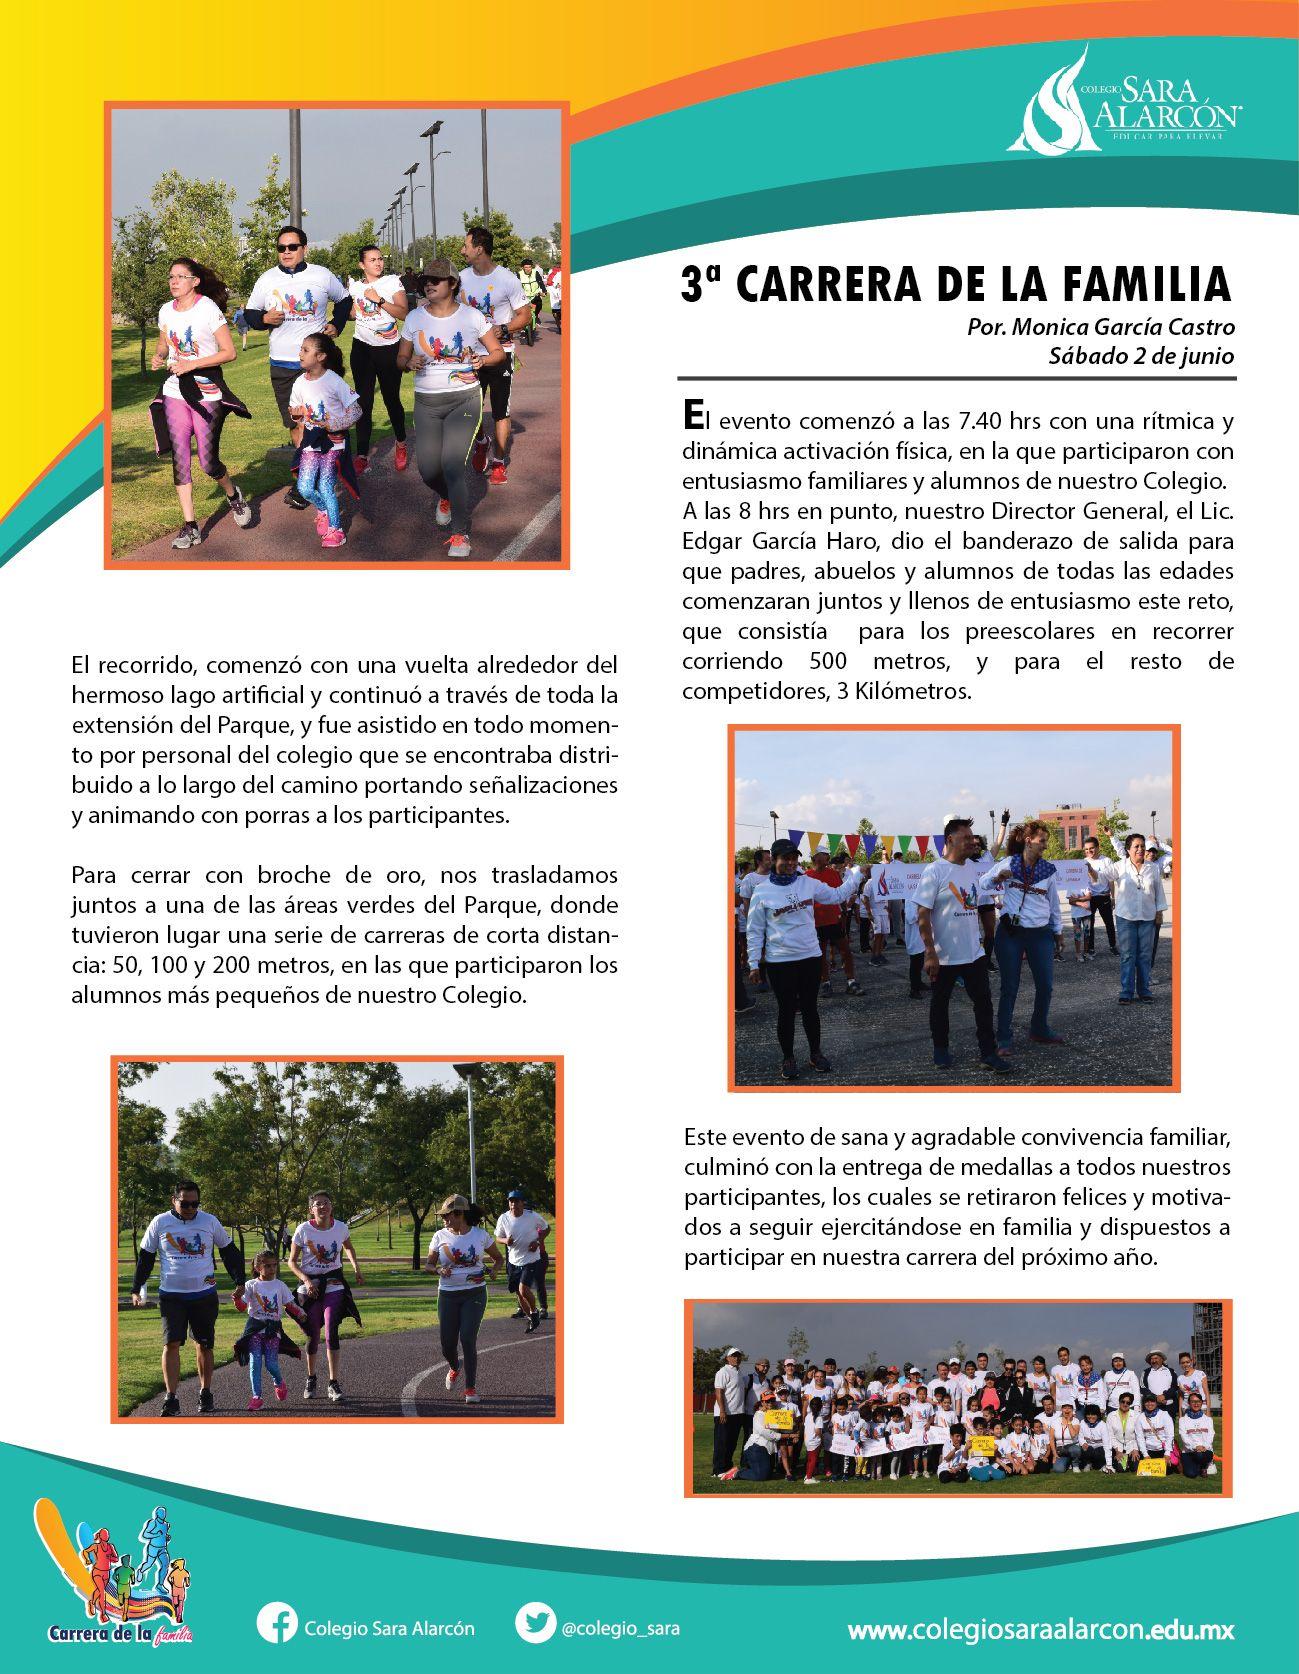 3° CARRERA DE LA FAMILIA